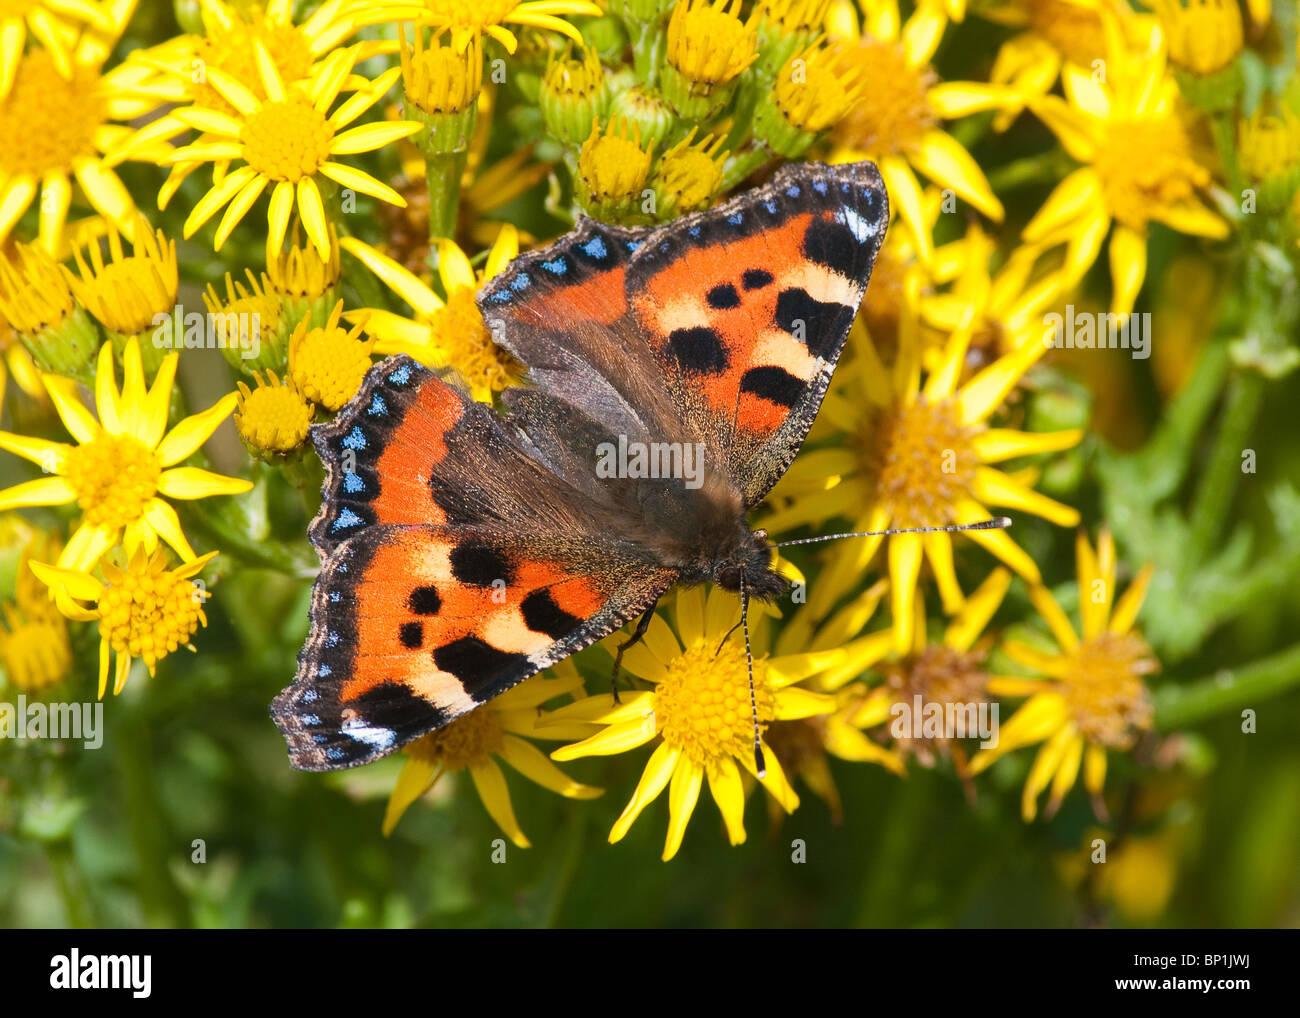 small-tortoiseshell-butterfly-aglais-urt